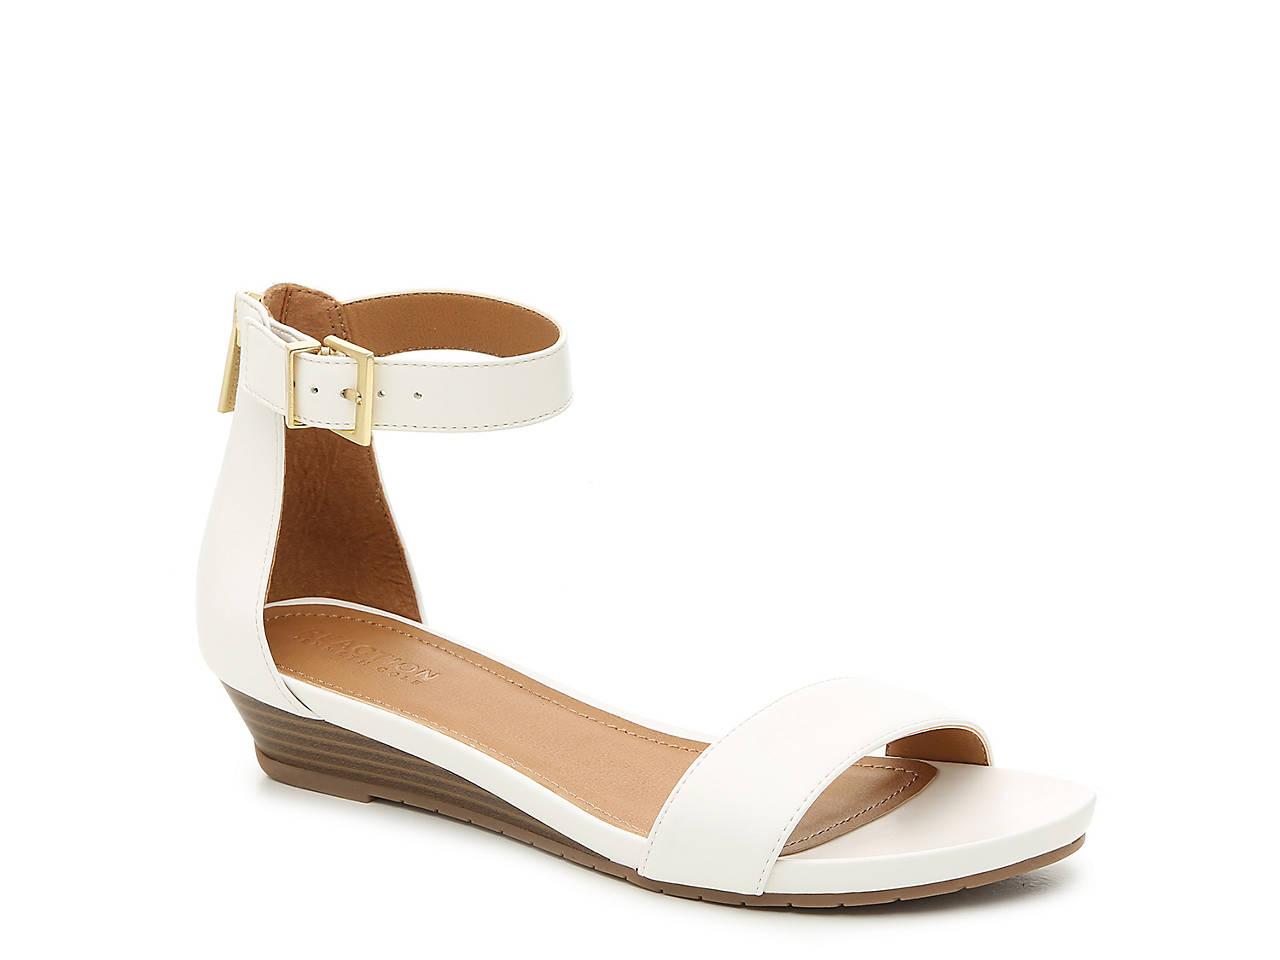 ea3f3117b Kenneth Cole Reaction Great Race Wedge Sandal Women s Shoes